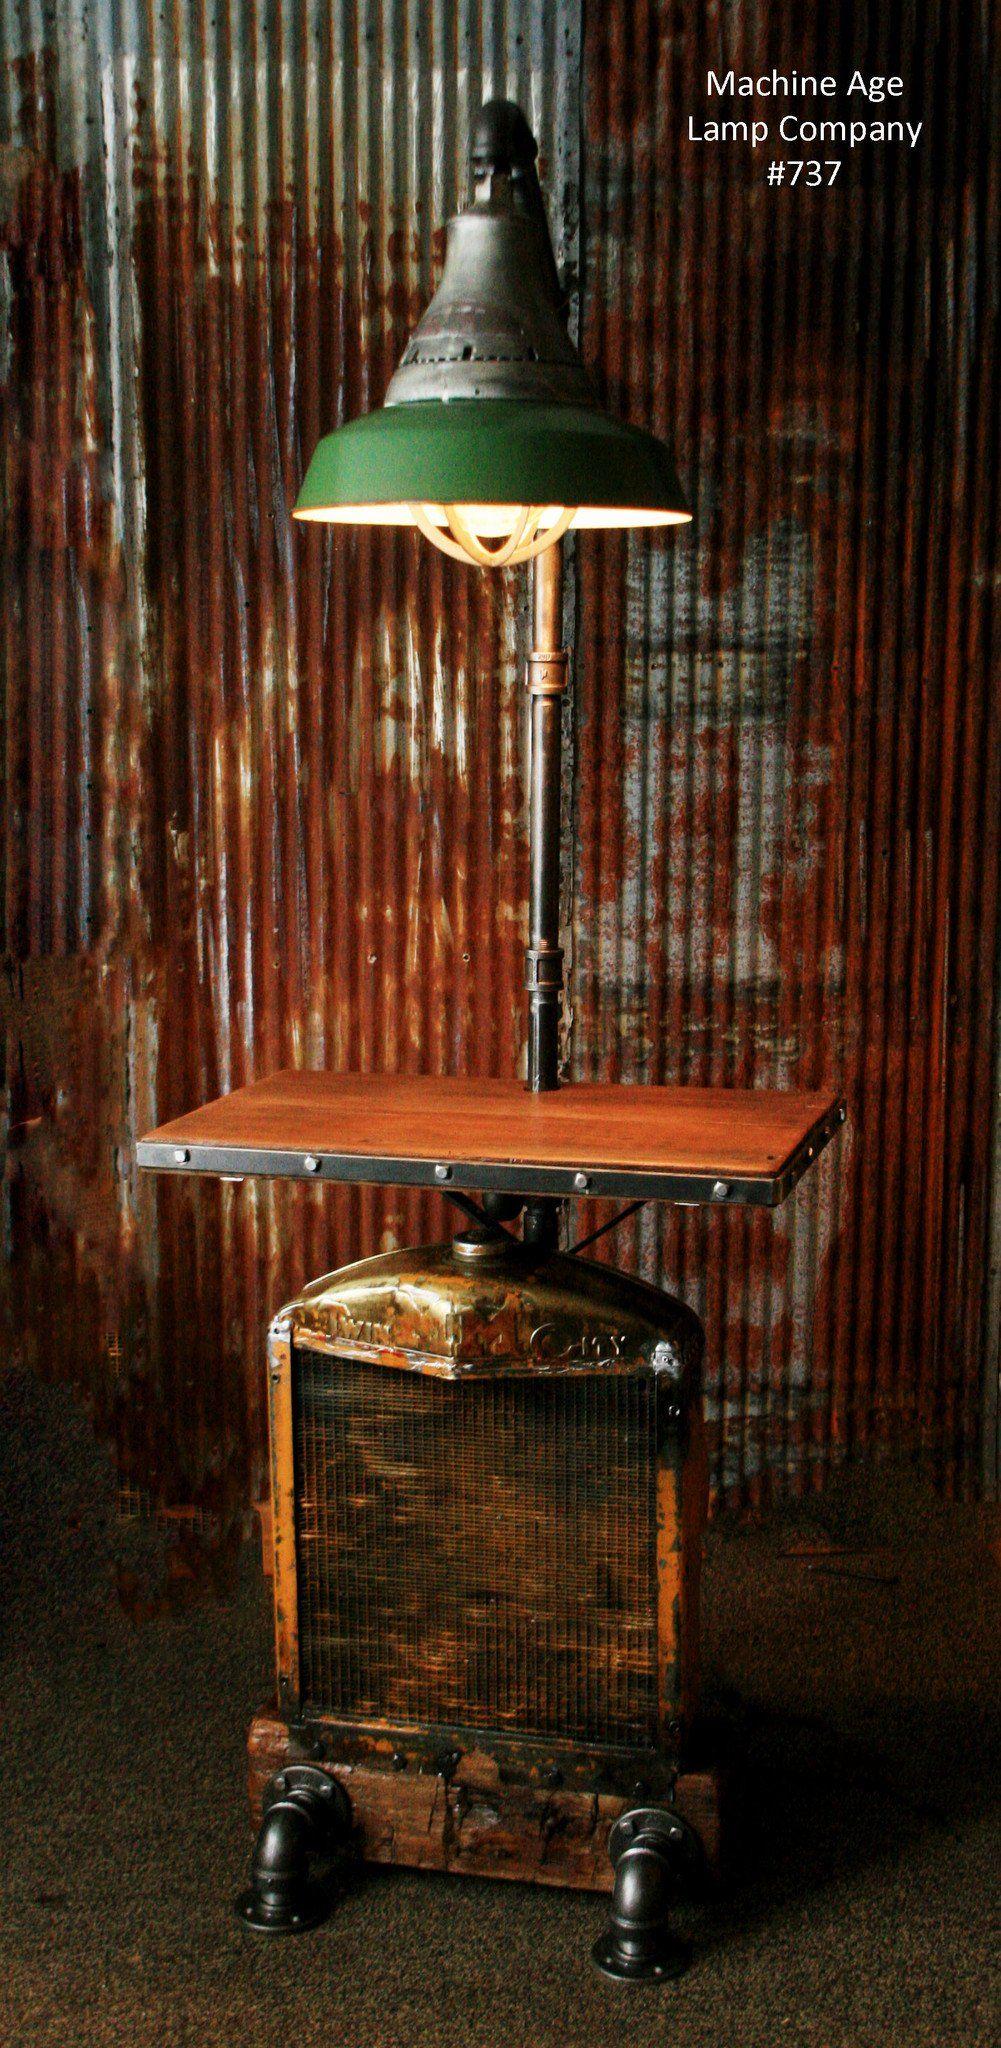 Farmhouse Style Floor Lamp Design on mission style floor lamp, shabby chic floor lamp, rustic style floor lamp, vintage style floor lamp, colonial style floor lamp, studio style floor lamp, modern style floor lamp, antique style floor lamp, cabin style floor lamp, lantern style floor lamp, factory style floor lamp, roman column floor lamp, country style floor lamp, prairie style floor lamp, industrial style floor lamp, cottage floor lamp, barn style floor lamp, beach style floor lamp, federal style floor lamp, victorian style floor lamp,